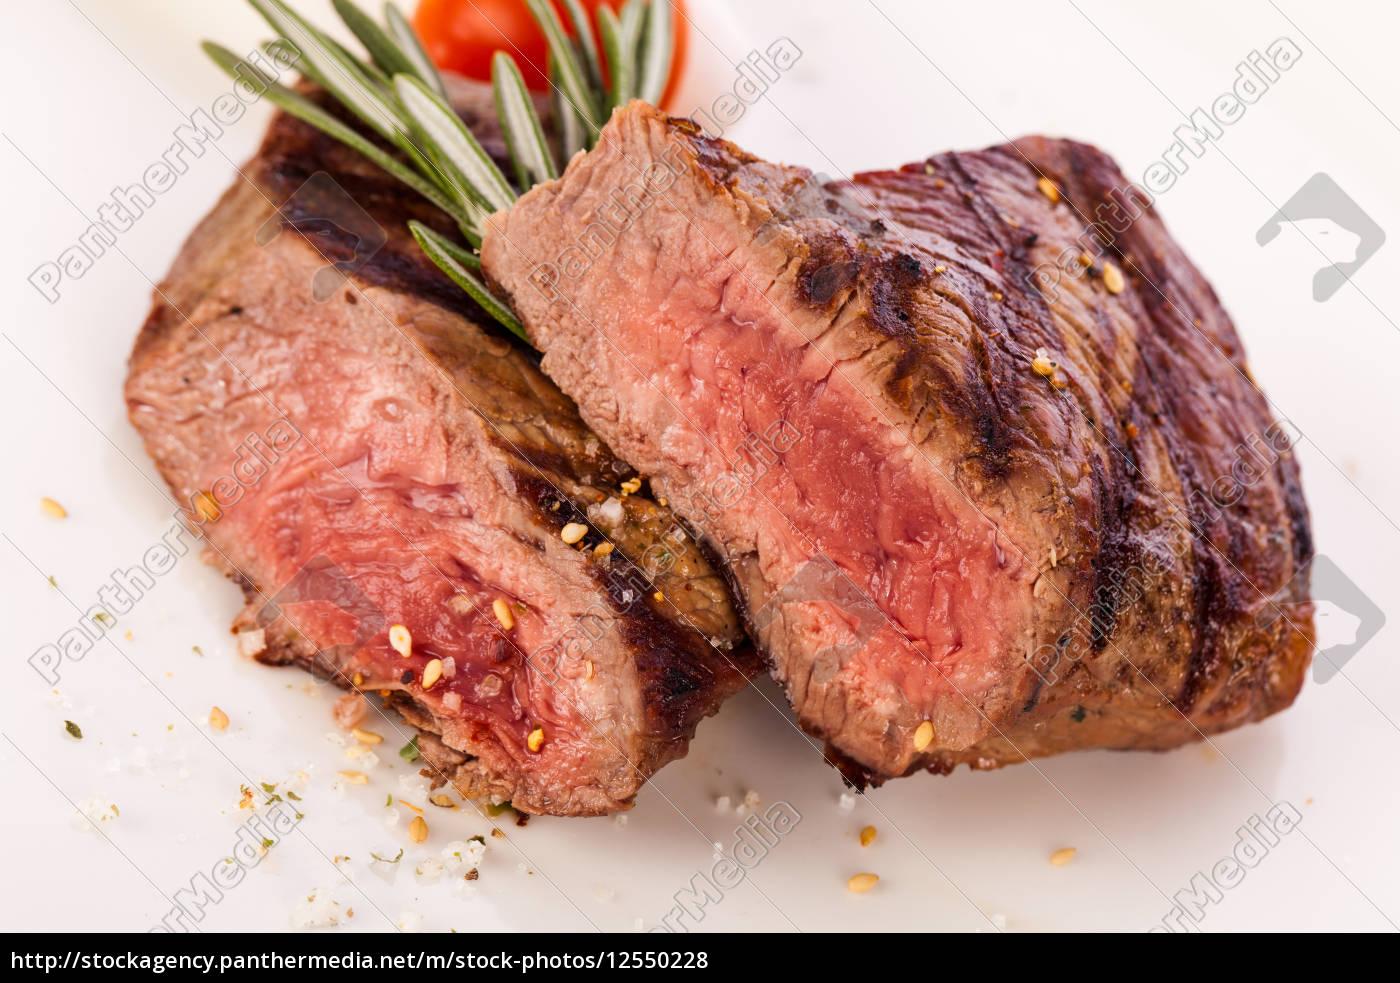 medium, gebratenes, rindersteak, filet, mit, pfeffer - 12550228